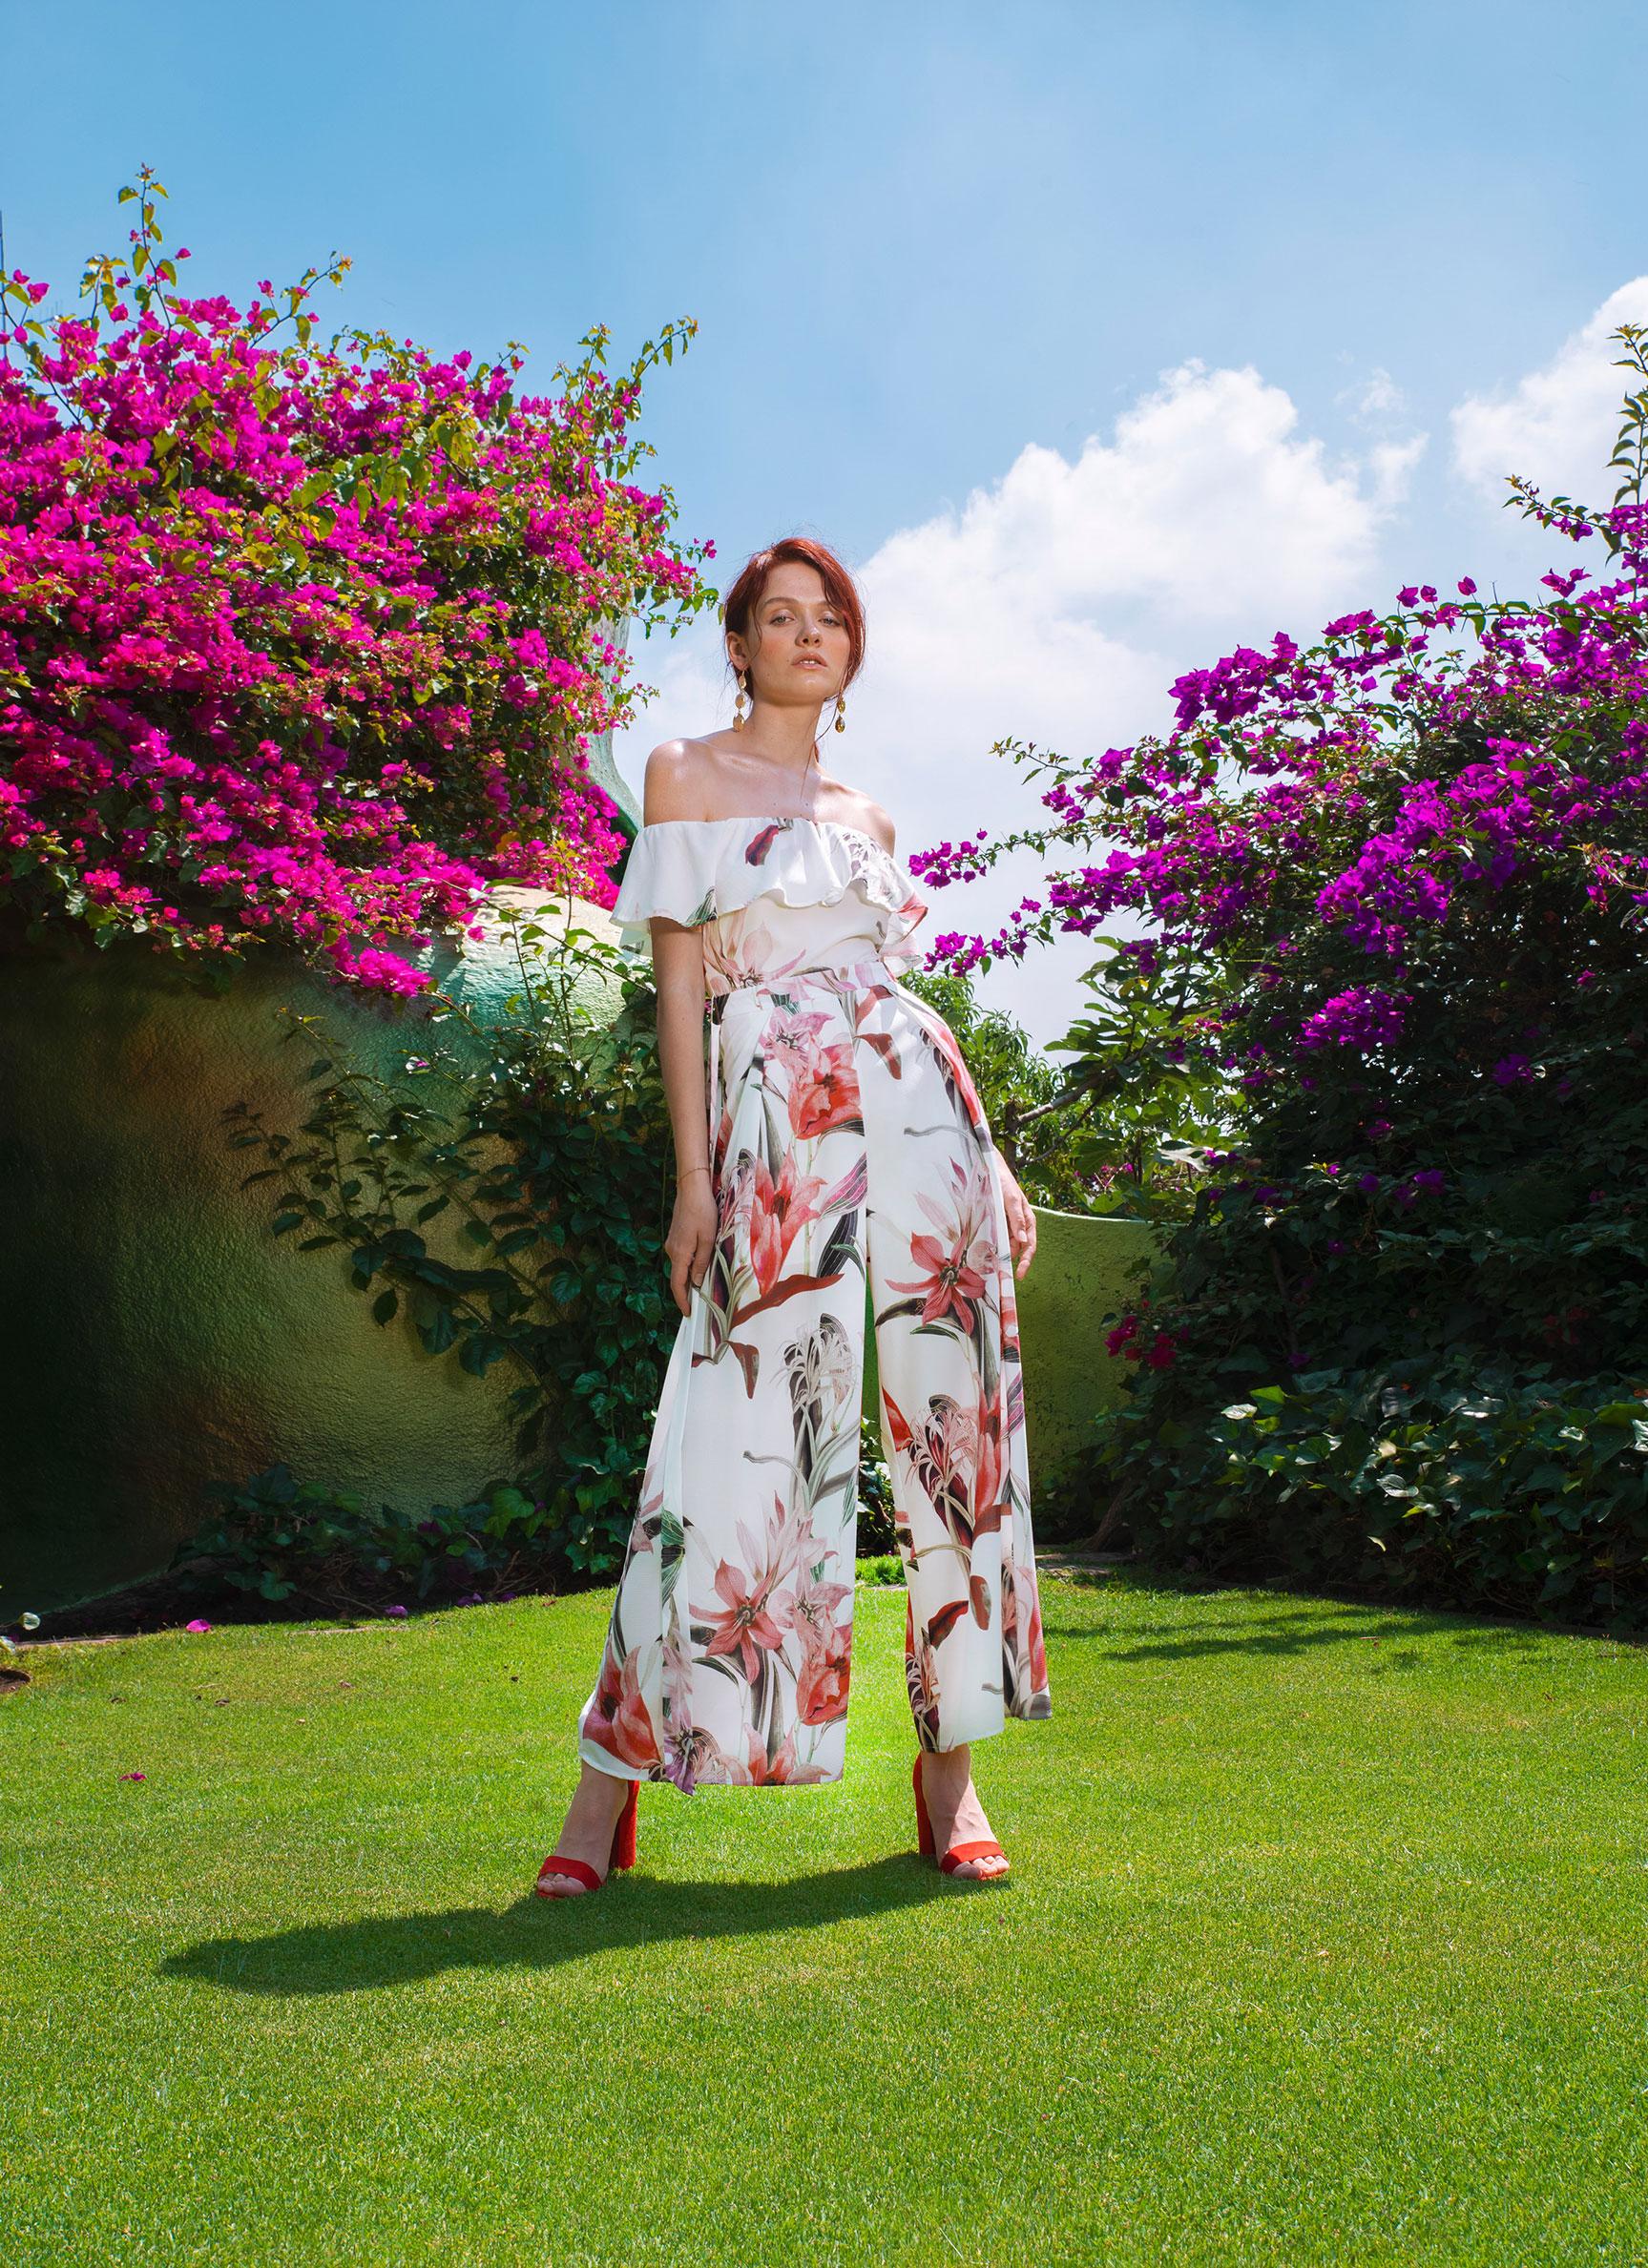 Модная одежда Turquoise, весна-лето 2019 / Anna Bertulite by Jvdas Berra